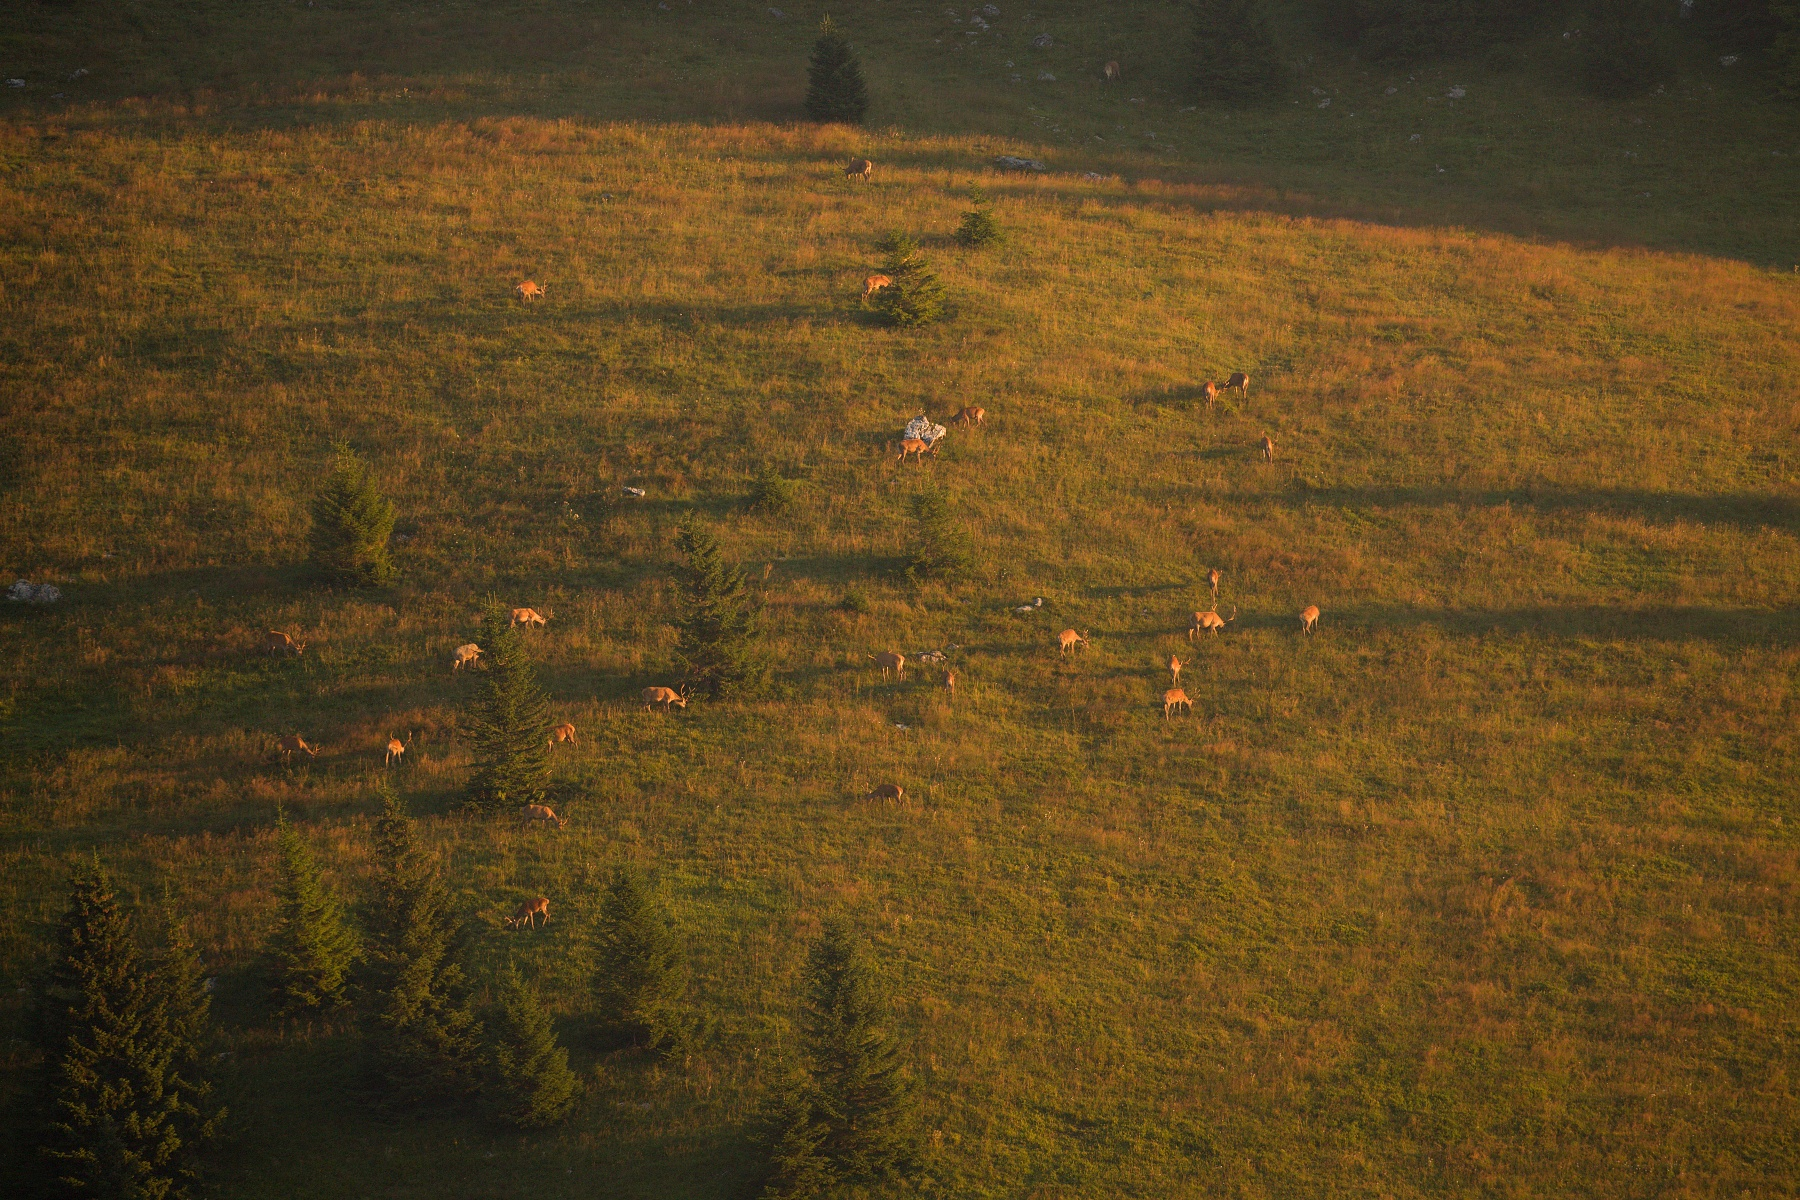 jeleň lesný (Cervus elaphus) Red deer, Veľká Fatra, Slovensko (1)